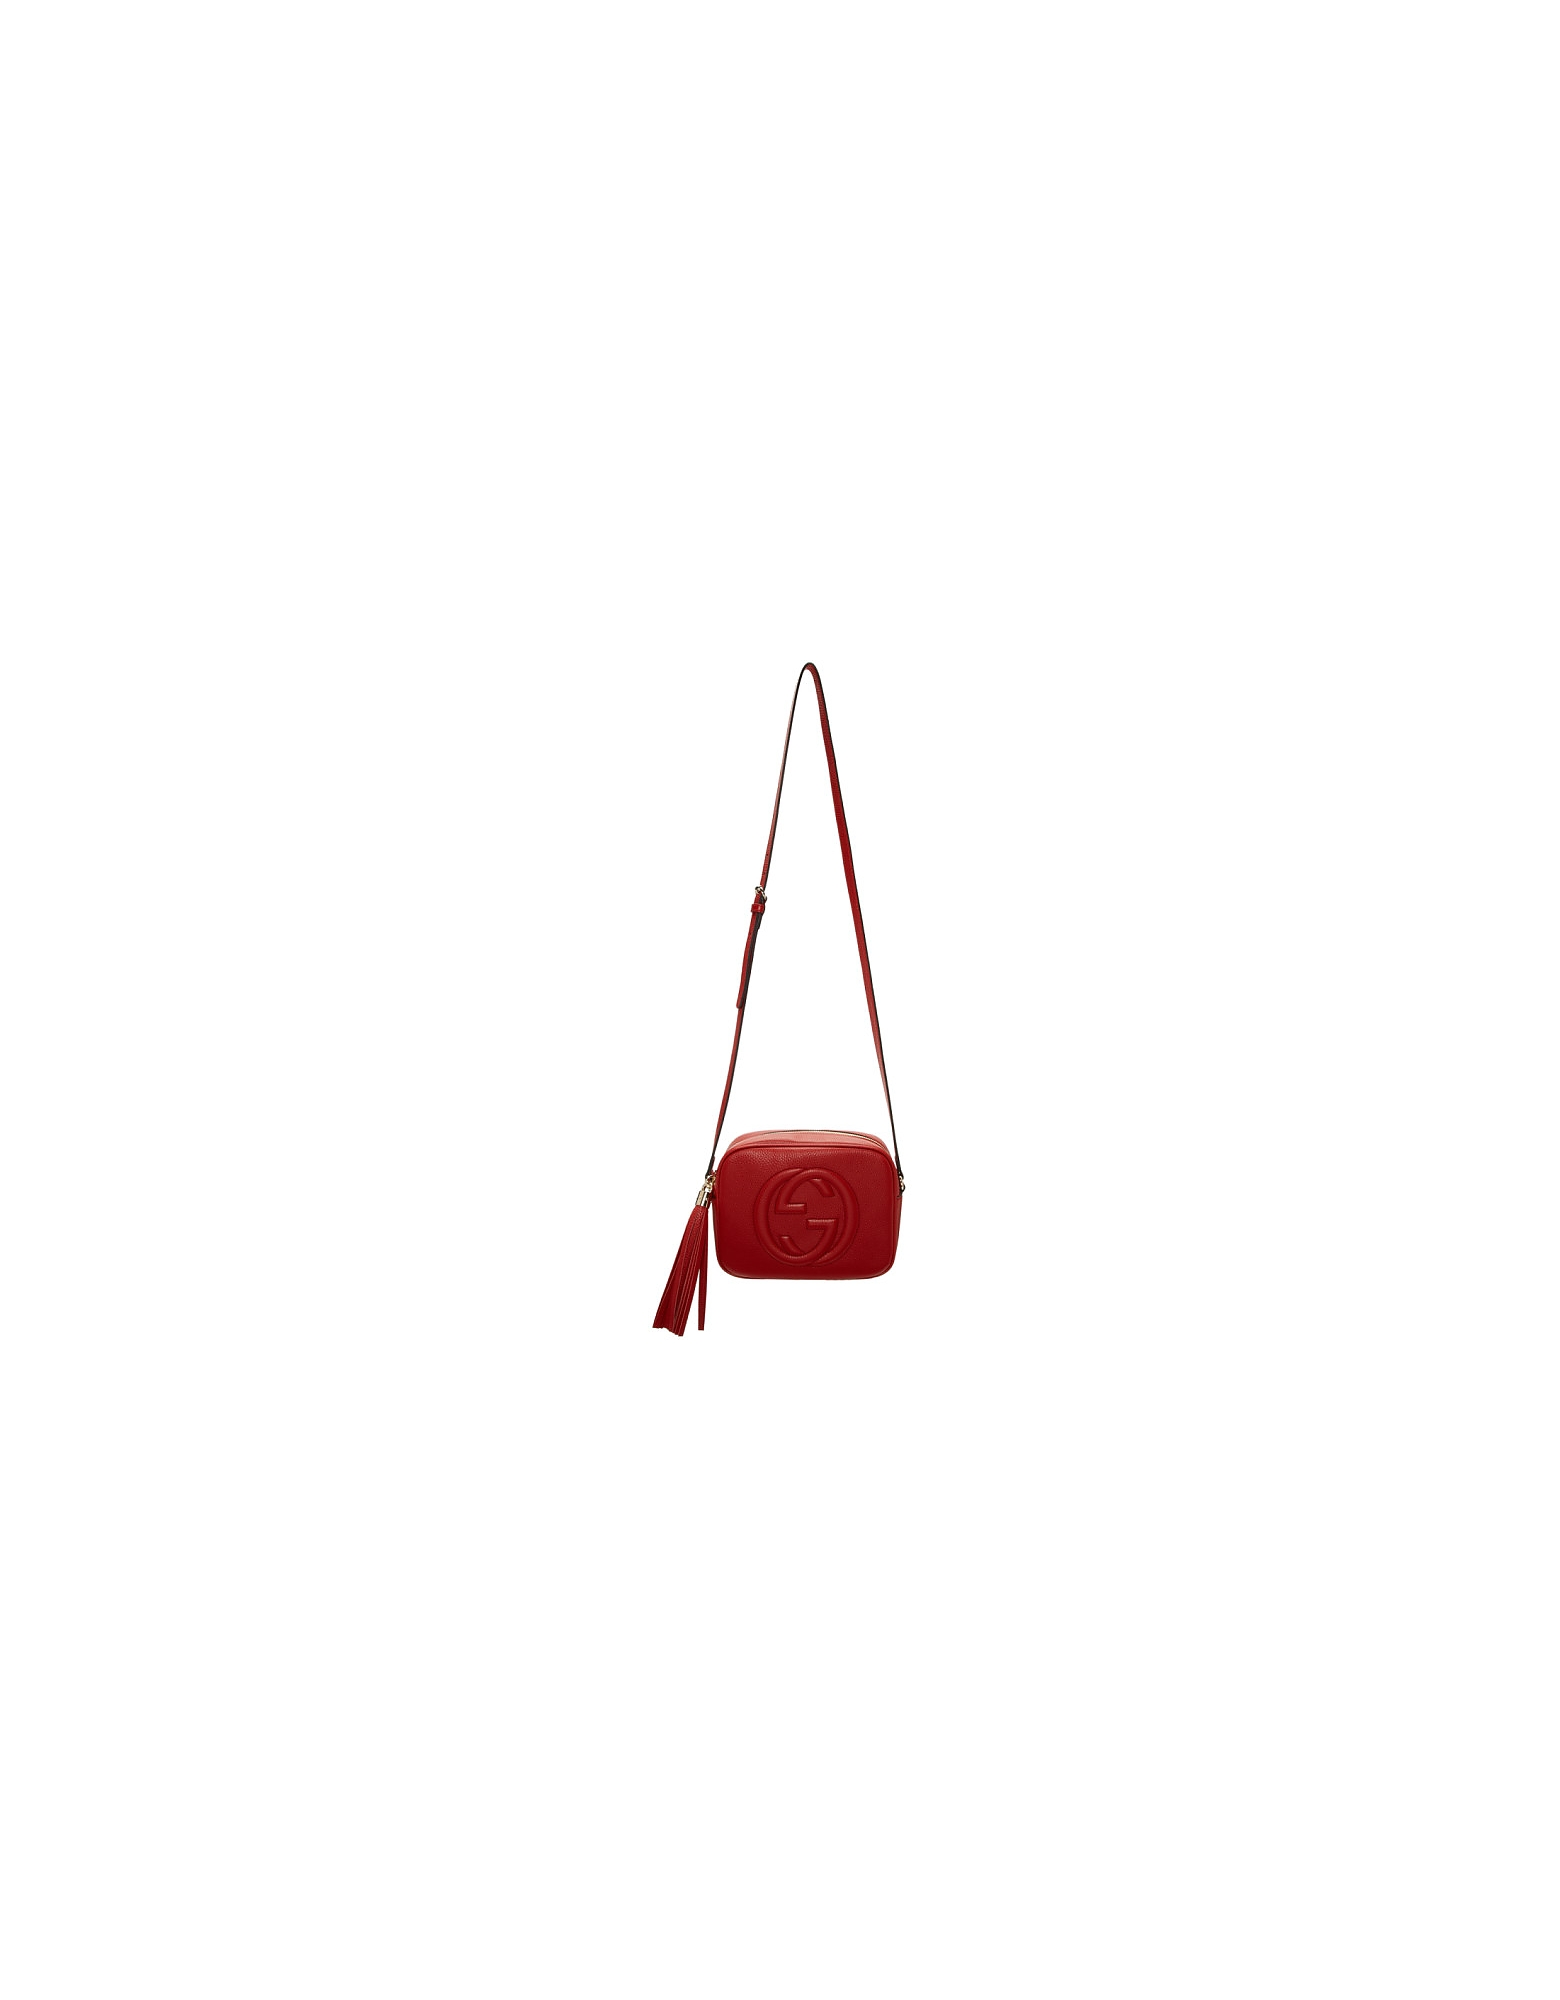 Gucci Designer Handbags, Red Small Soho Camera Bag